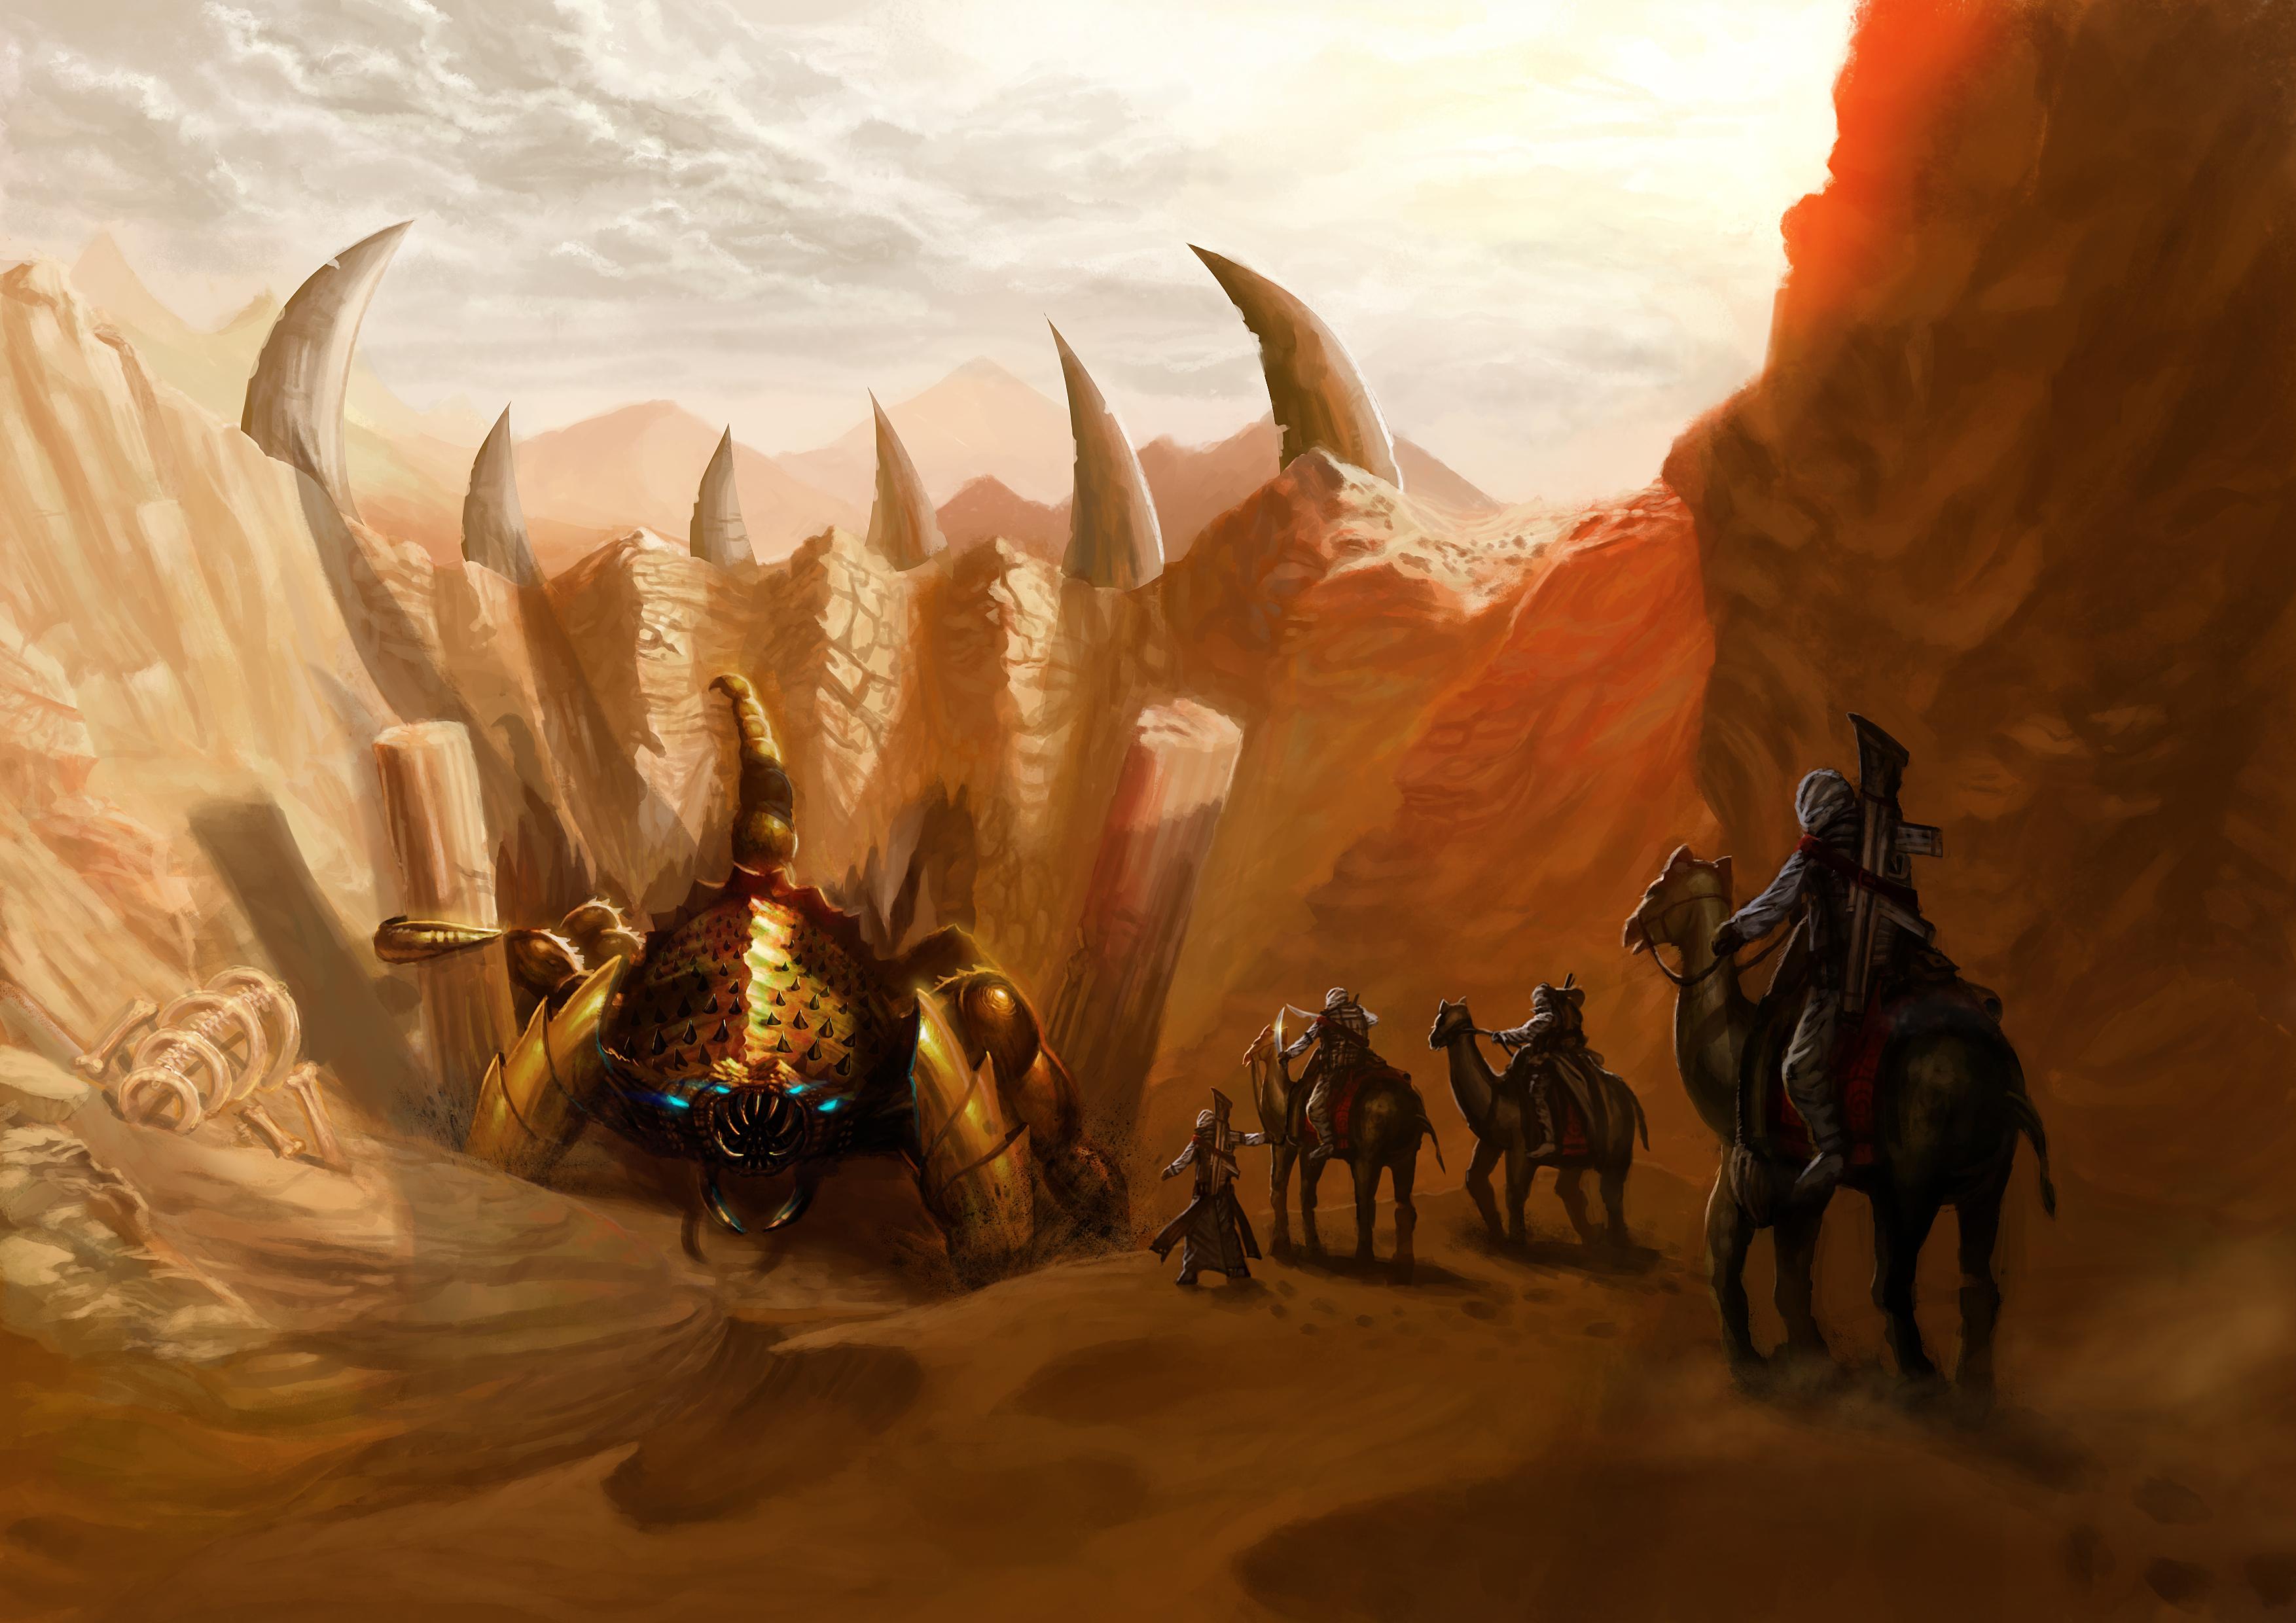 Desktop Wallpapers Monster Warriors Desert Scorpion 3508x2480